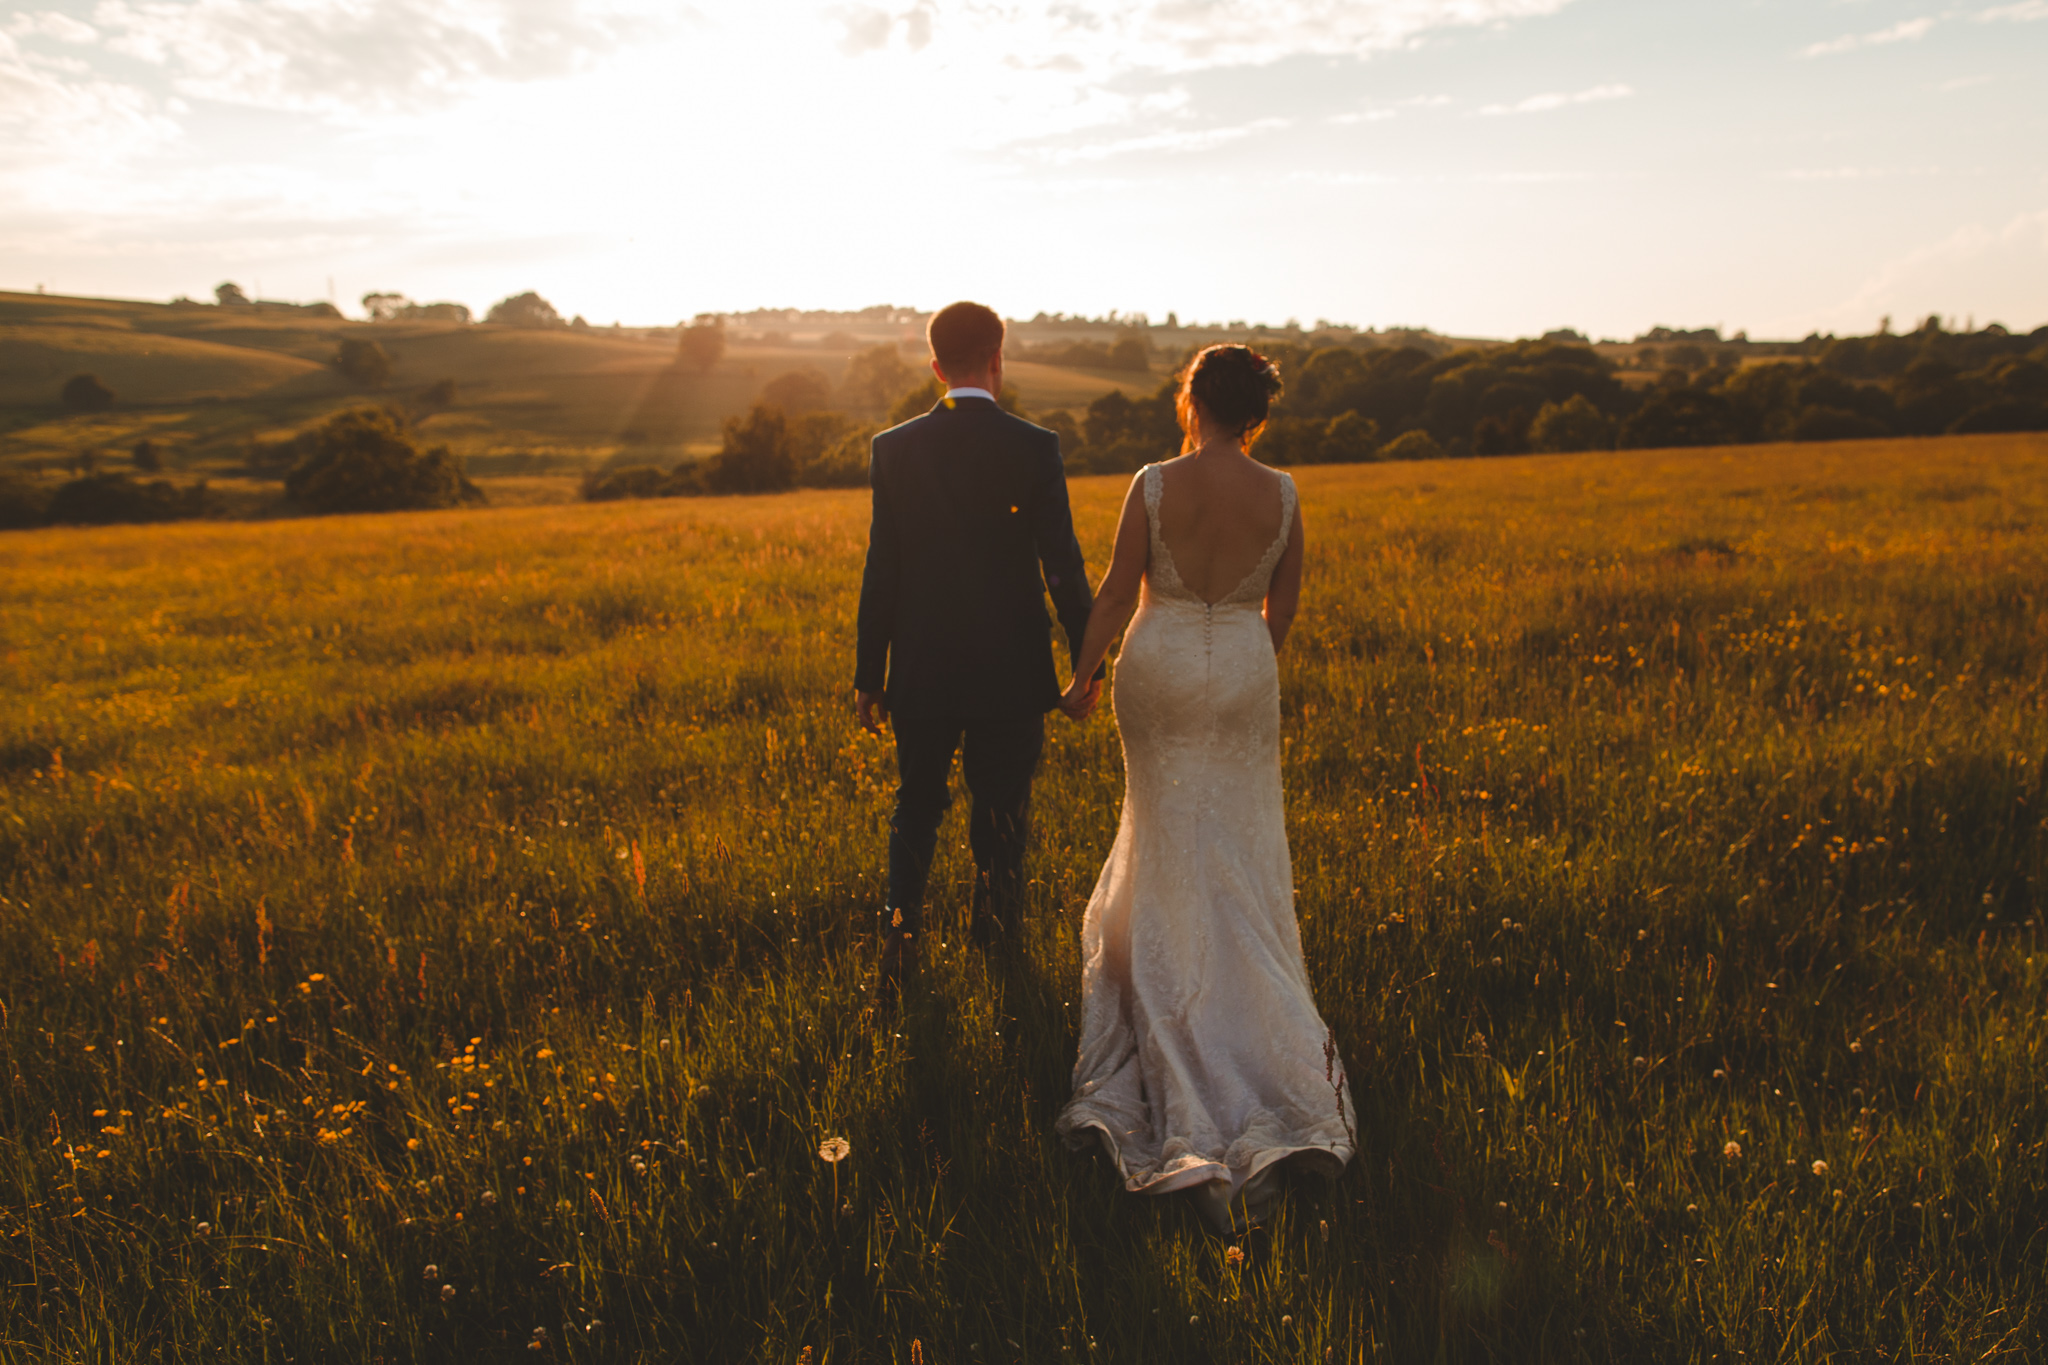 derbyshire-wedding-photographer-videographer-camera-hannah-50.jpg